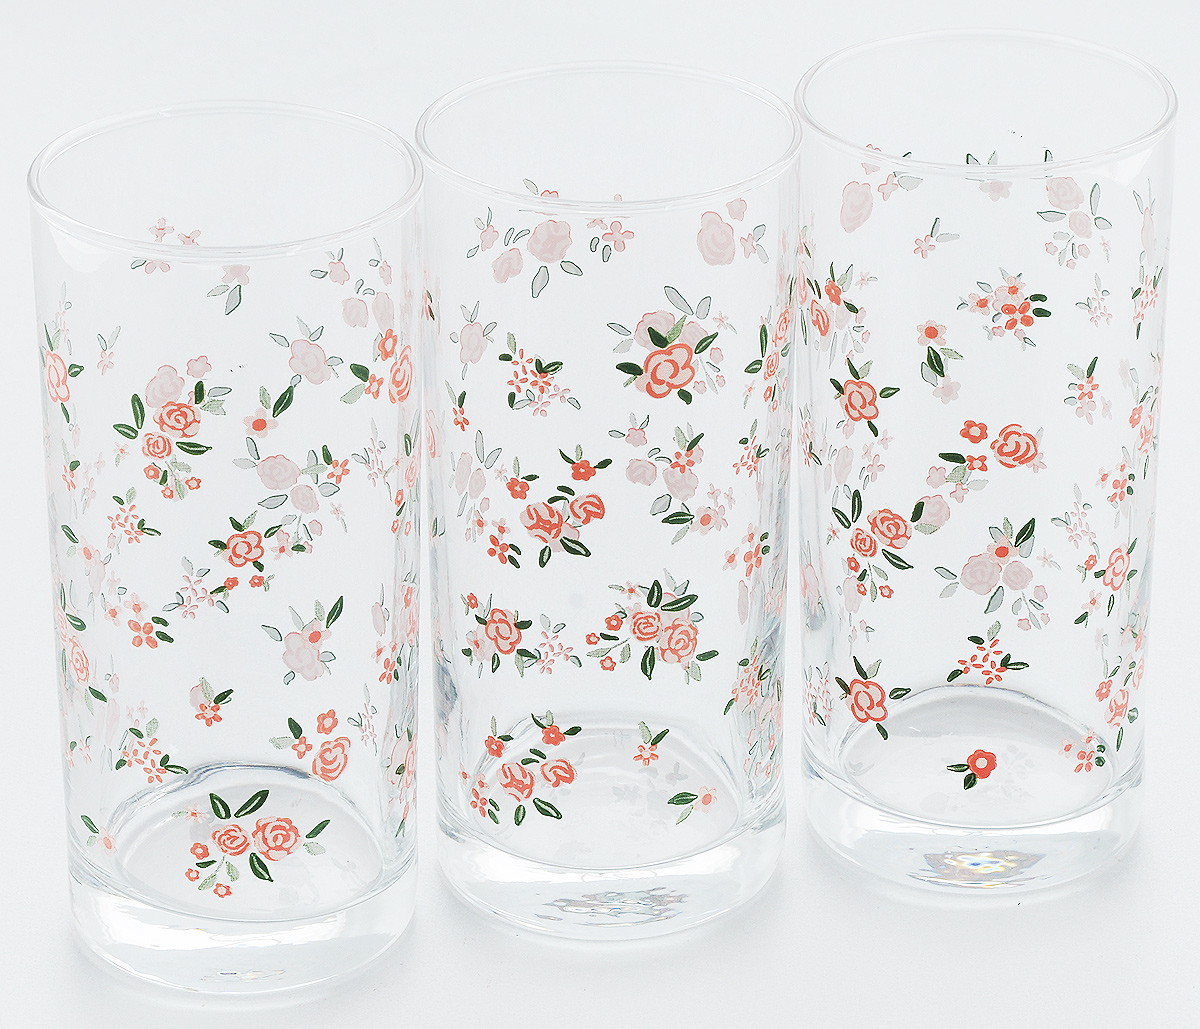 Набор стаканов Pasabahce Provence, 290 мл, 3 шт набор стаканов pasabahce provence 290 мл 3 шт